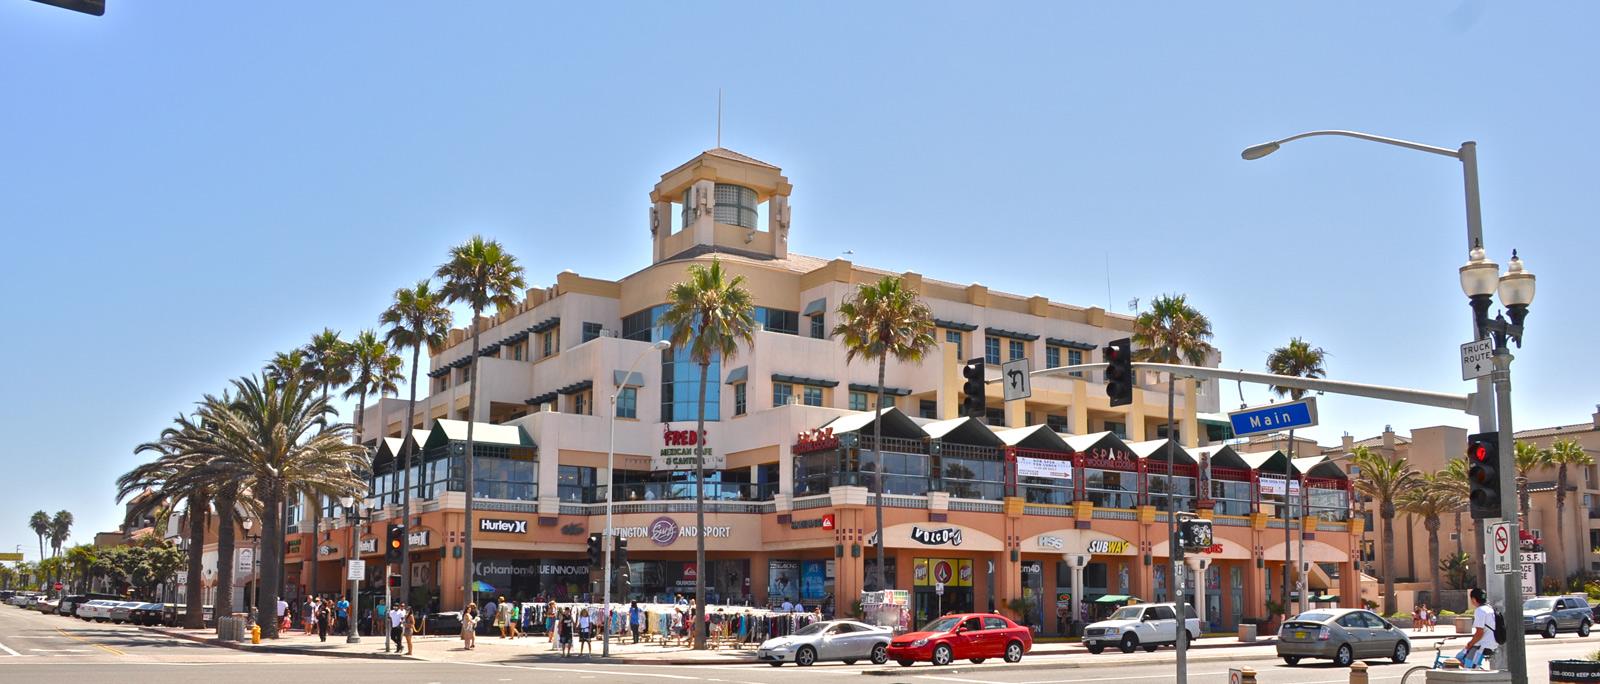 Huntington Beach Downtown Business Improvement District